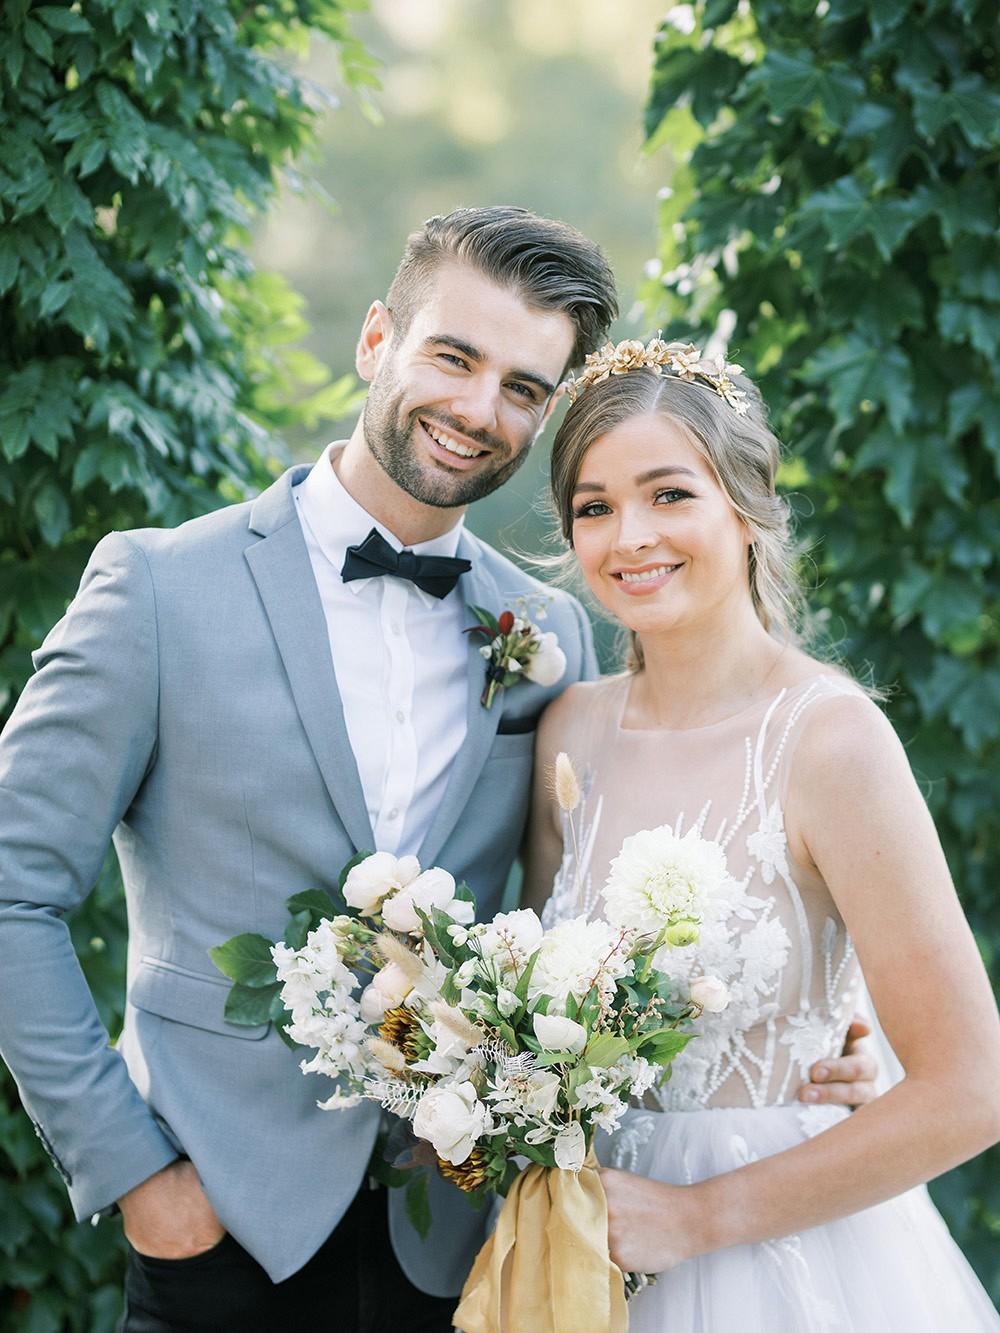 Lovers of the Light - Green & White Wedding Inspiration